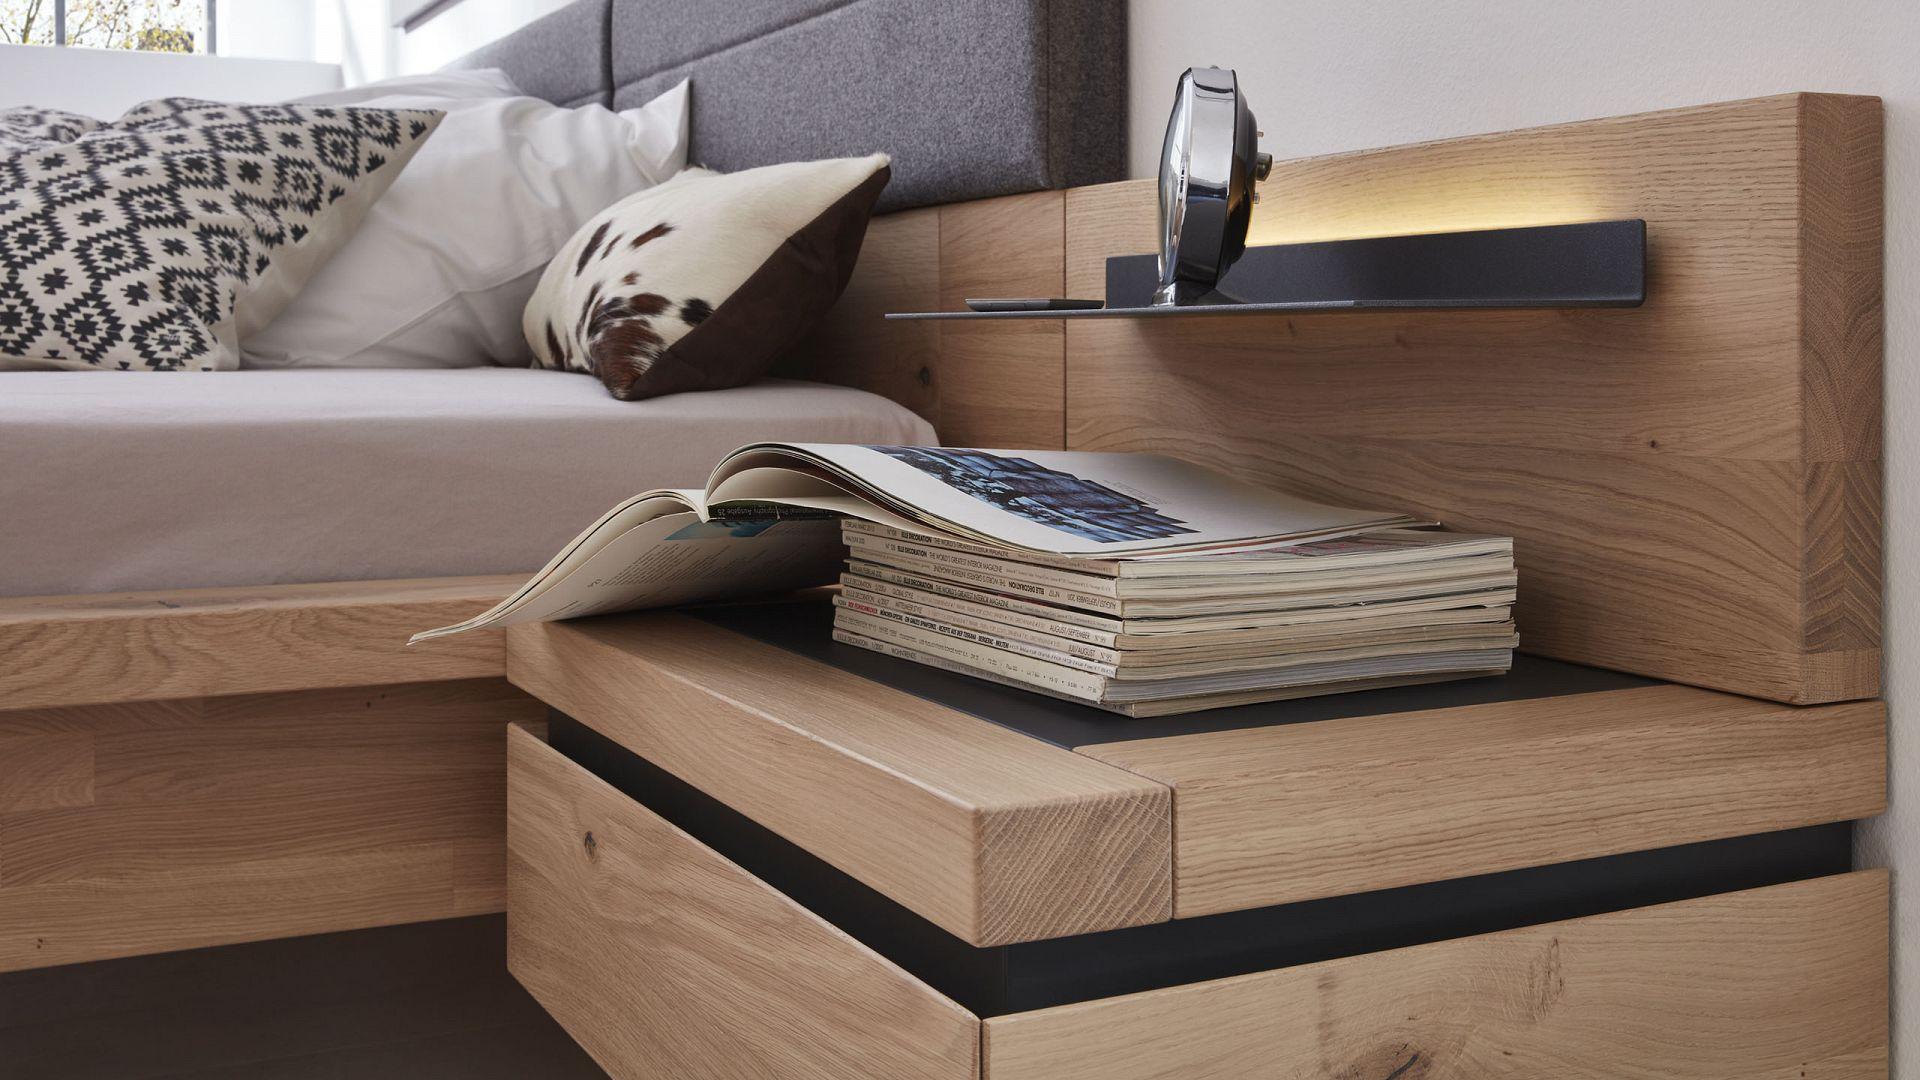 Interliving Schlafzimmer Serie 1005 Bett  modern  gnstig  Mbel Schaumann